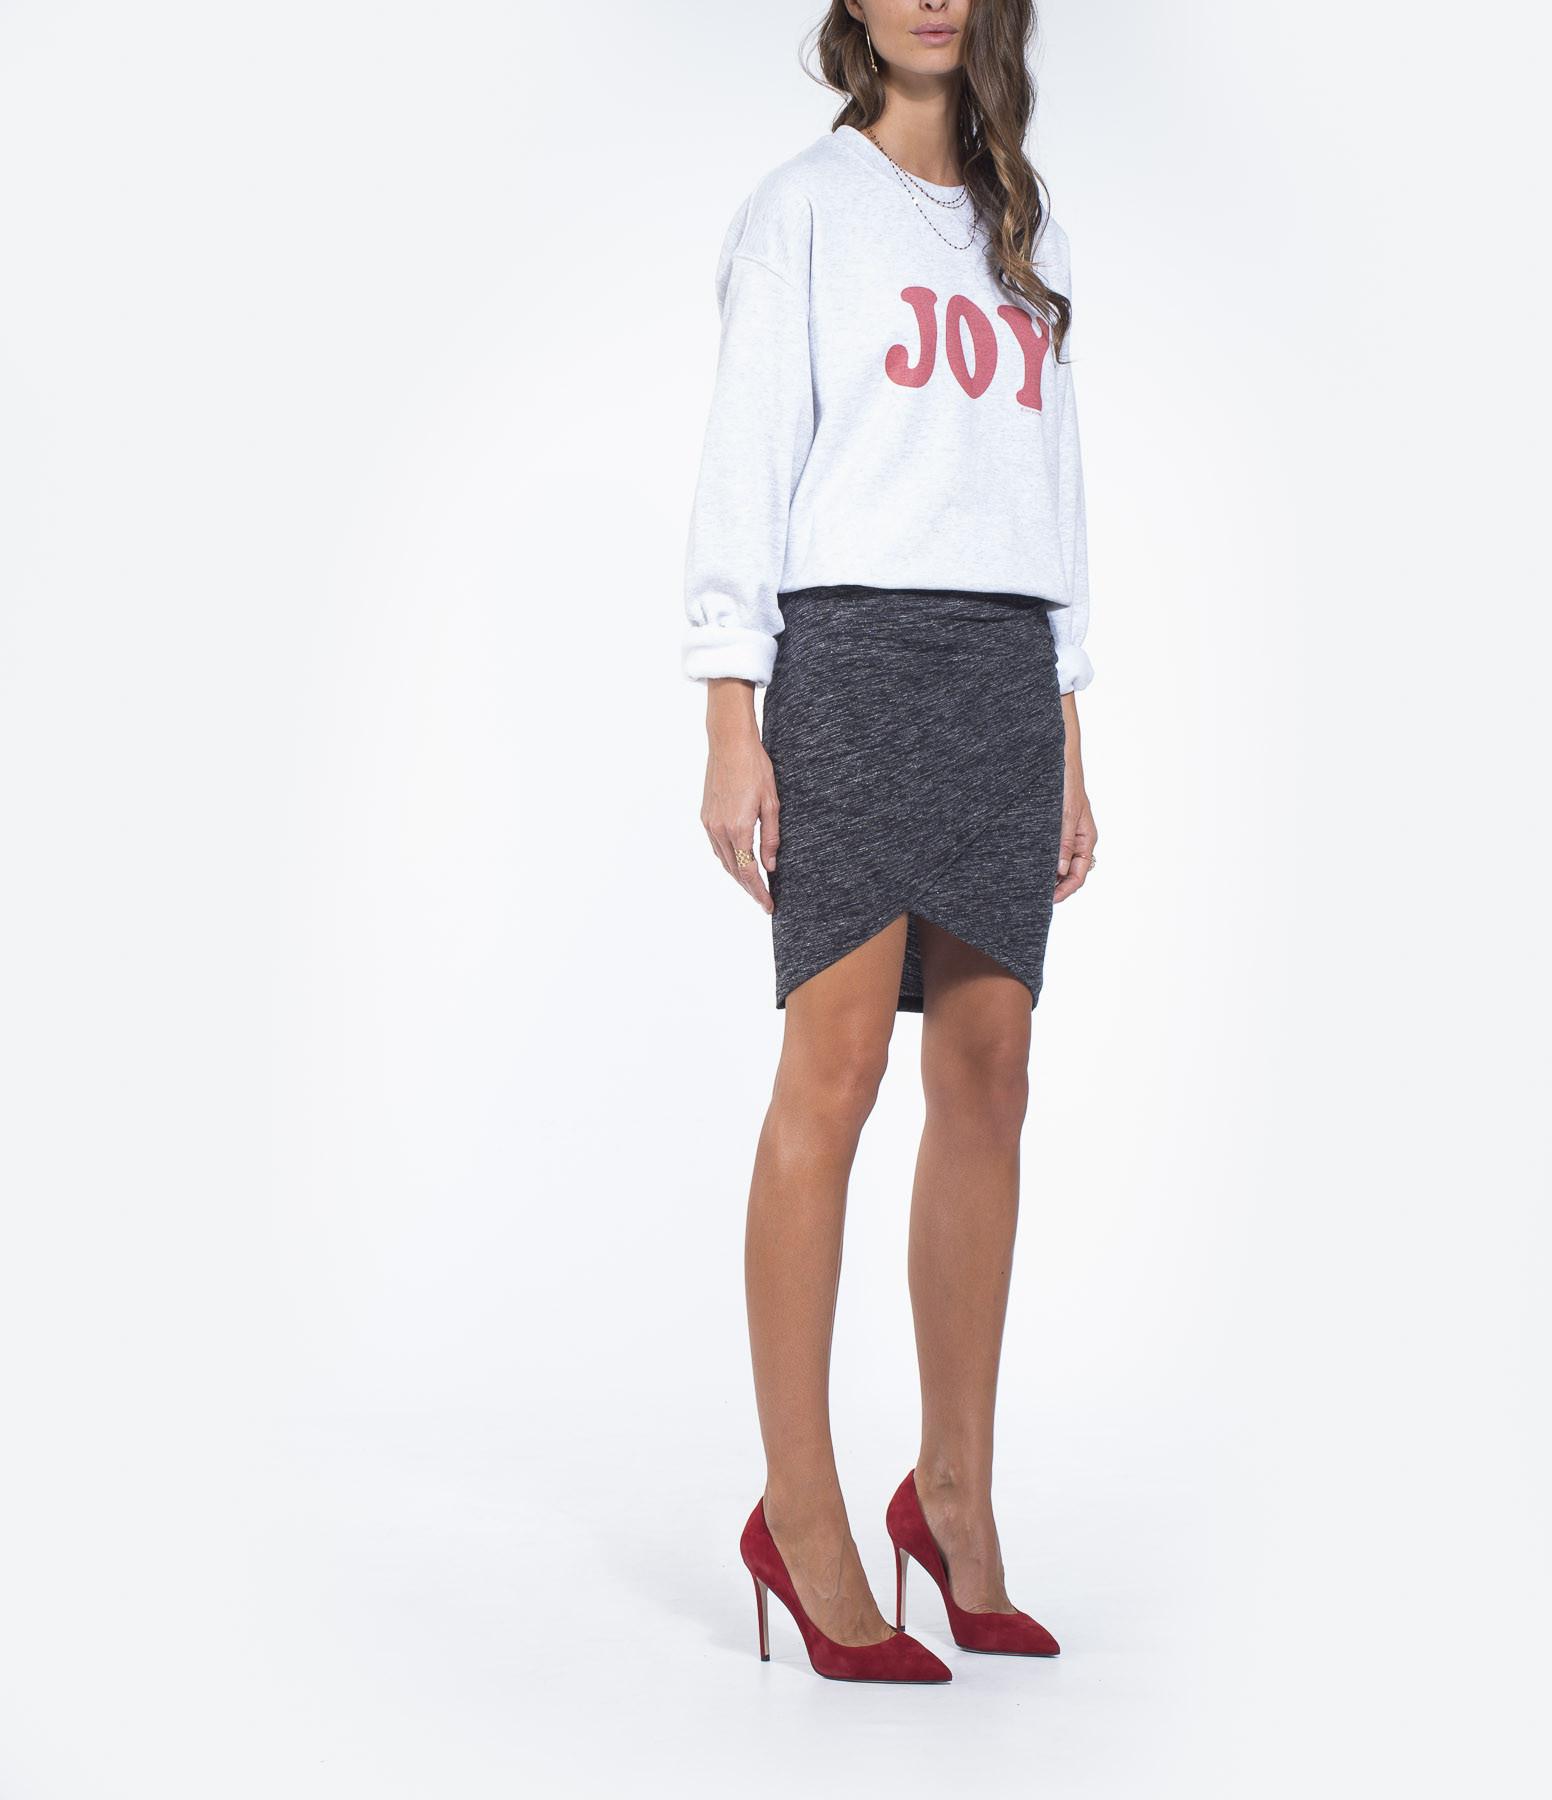 NEWTONE - Sweatshirt Joy Ash